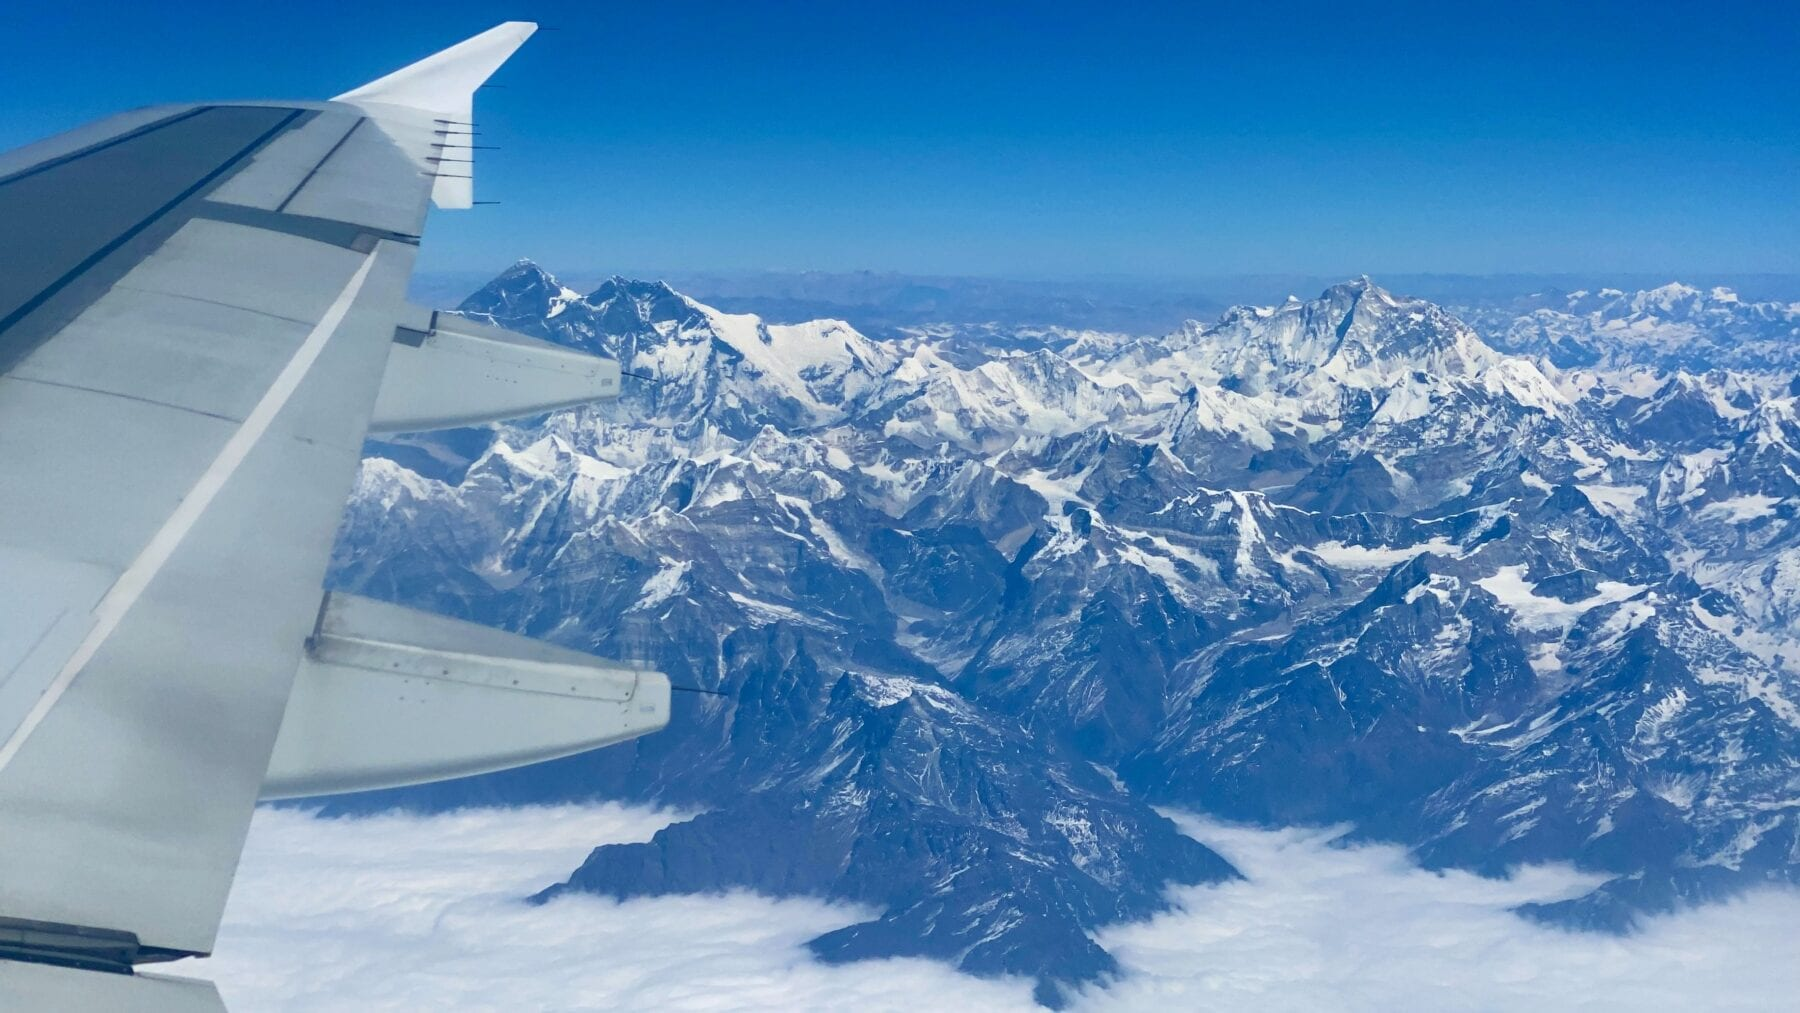 Mount Everest luchtfoto